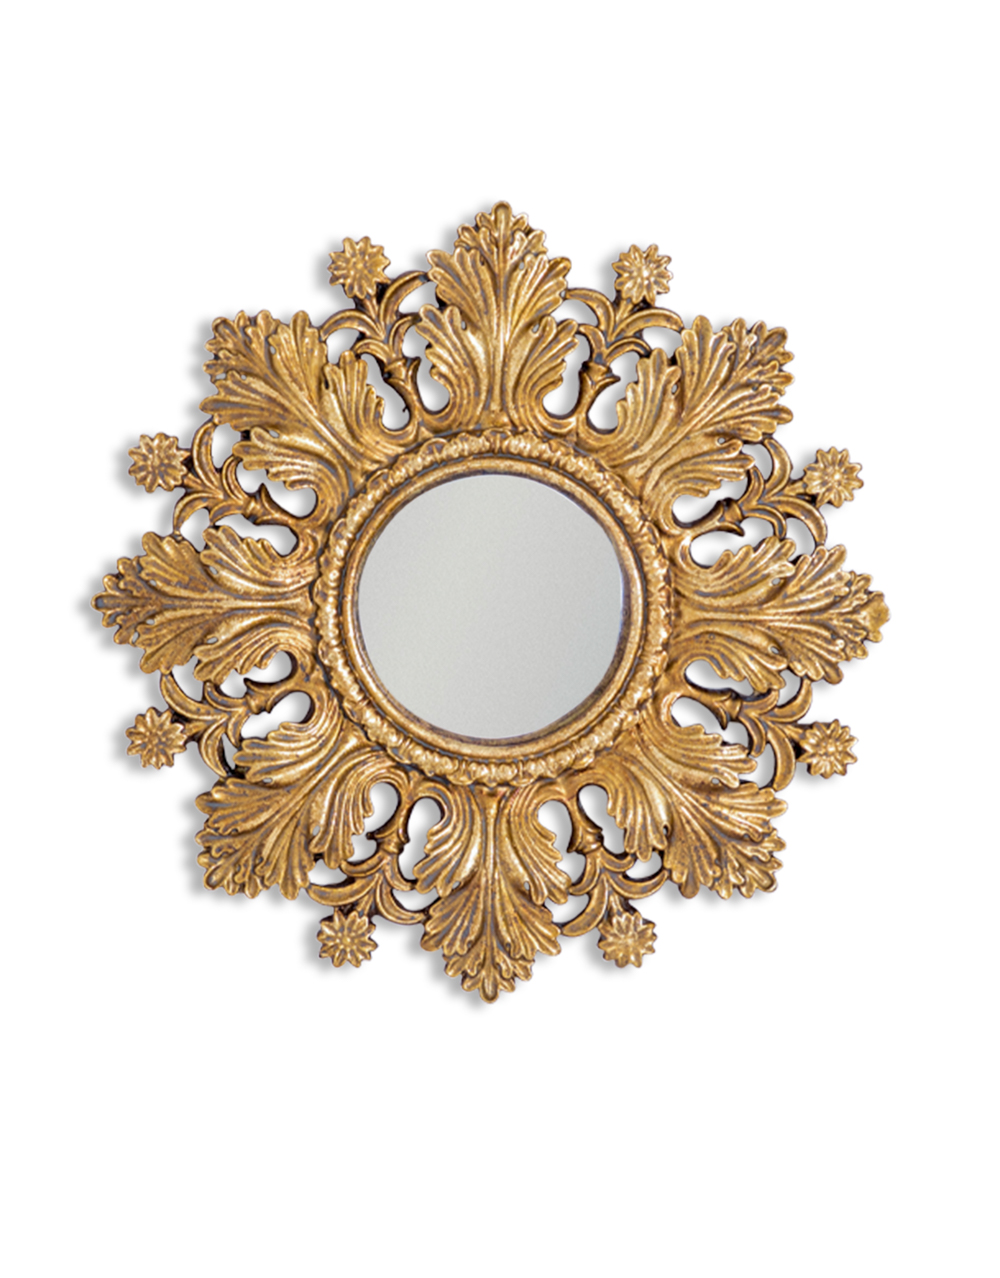 Antique Gold Floral Convex Mirror